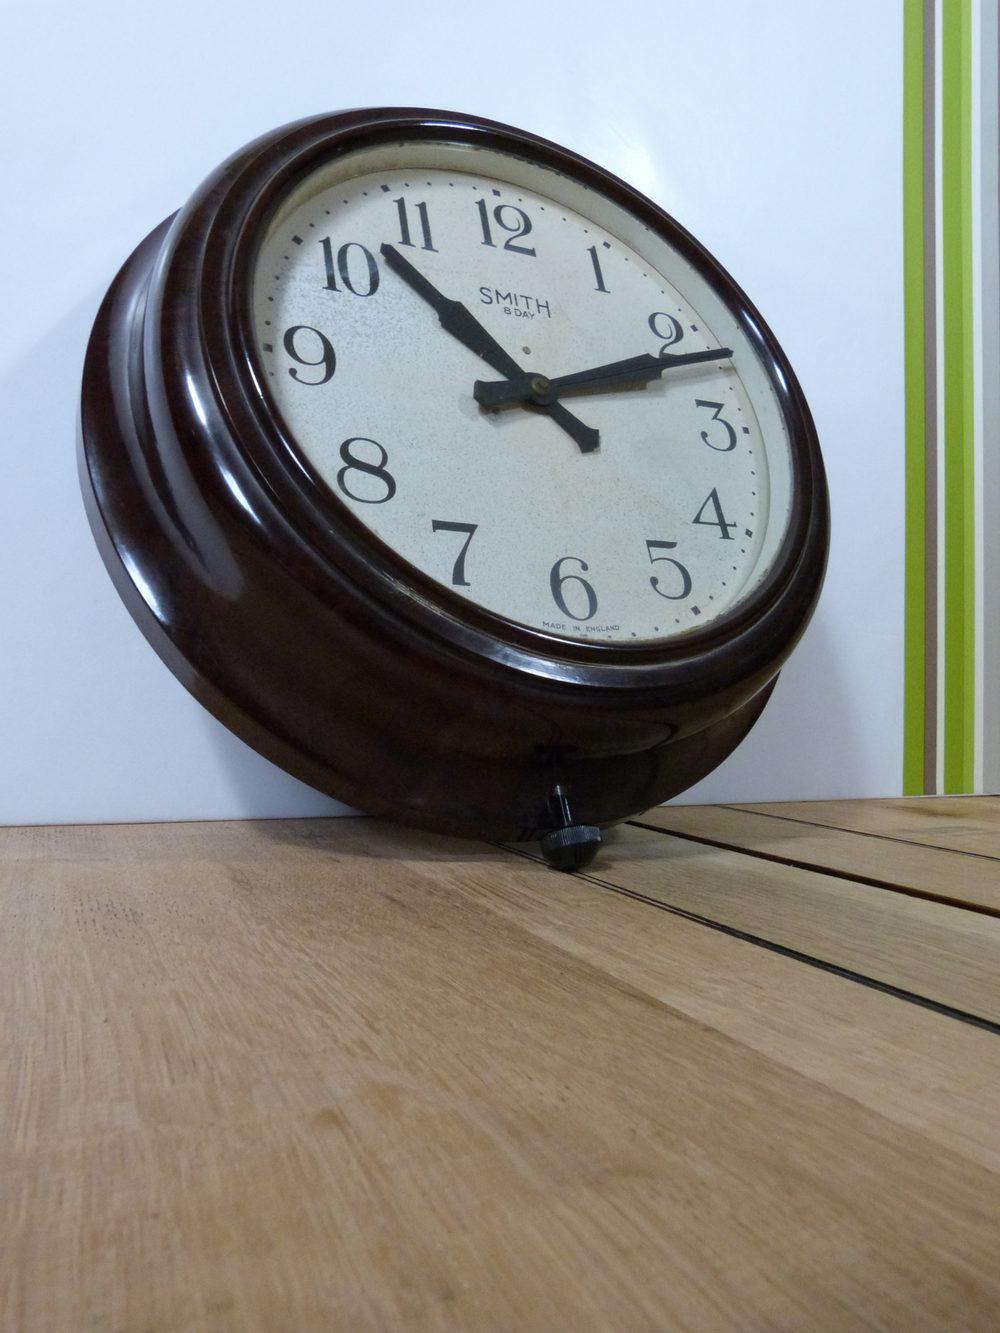 Antiques Atlas - Smith Bakelite Wall Clock